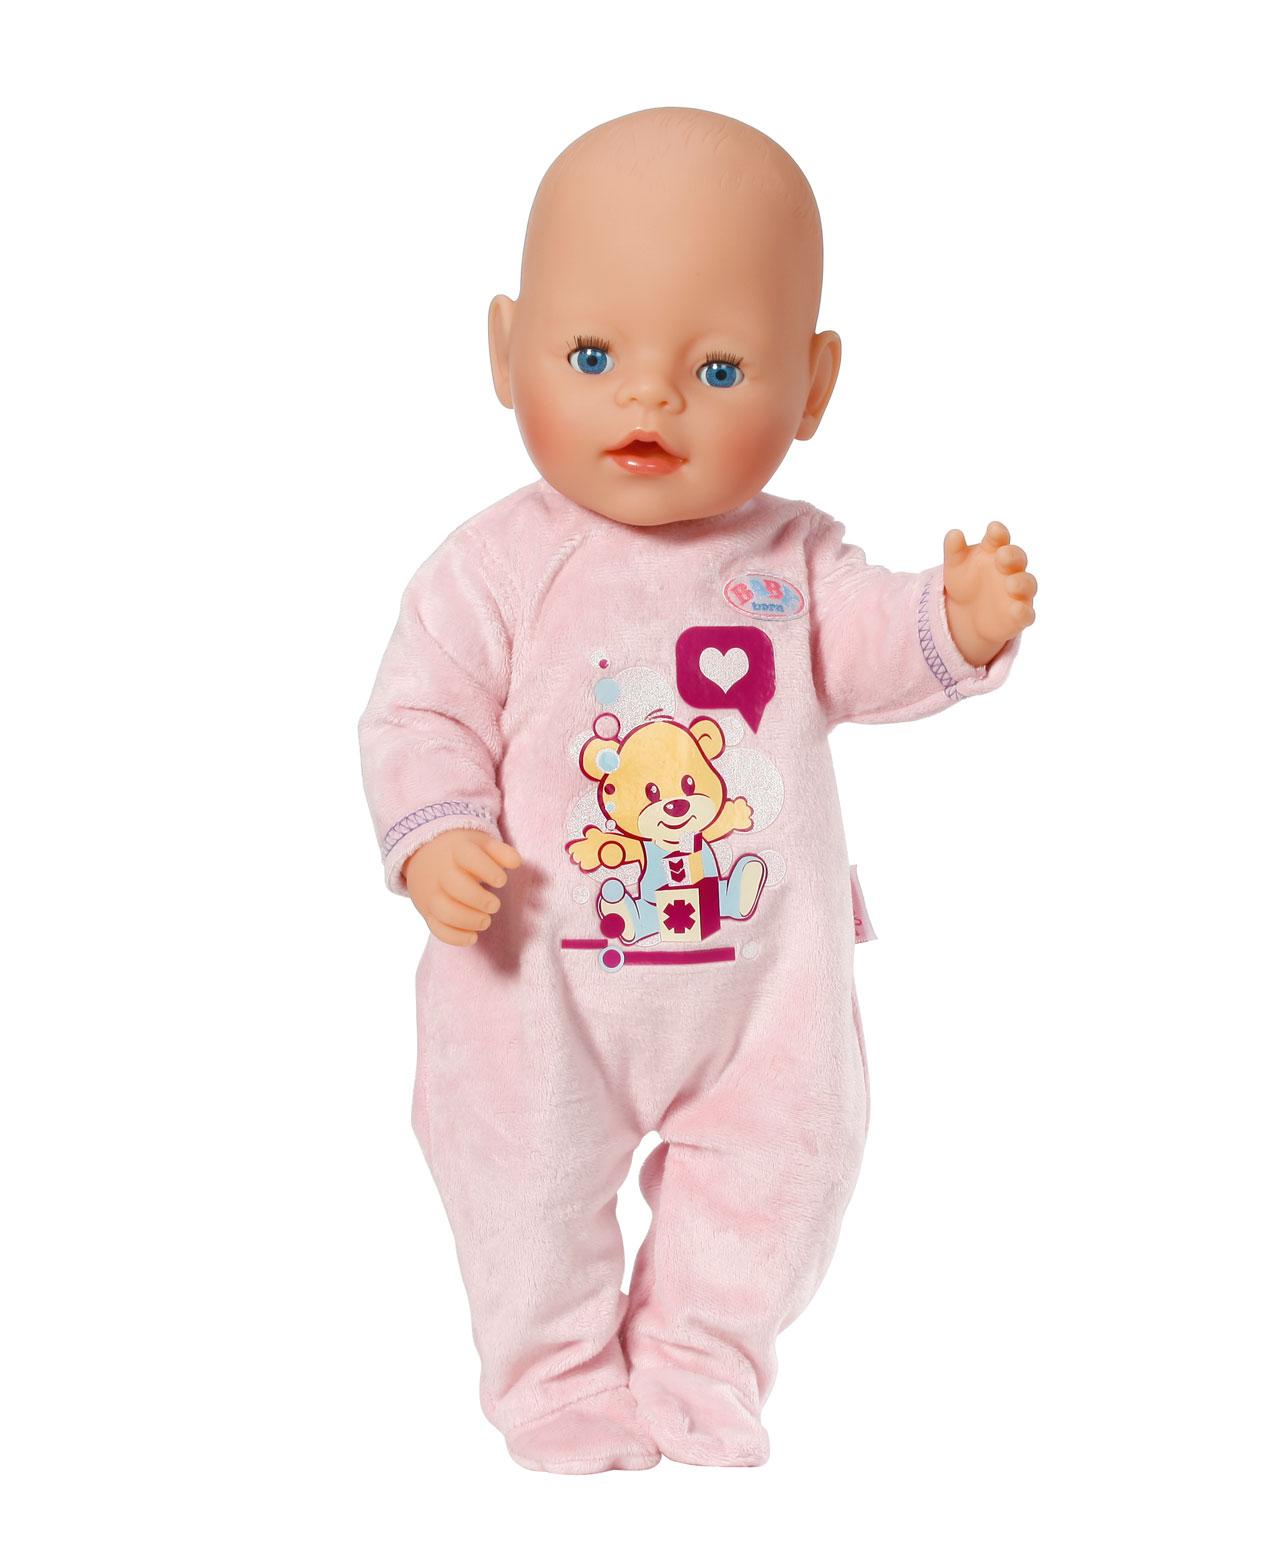 Baby Born Romper Collection Baby Born Prima Toys